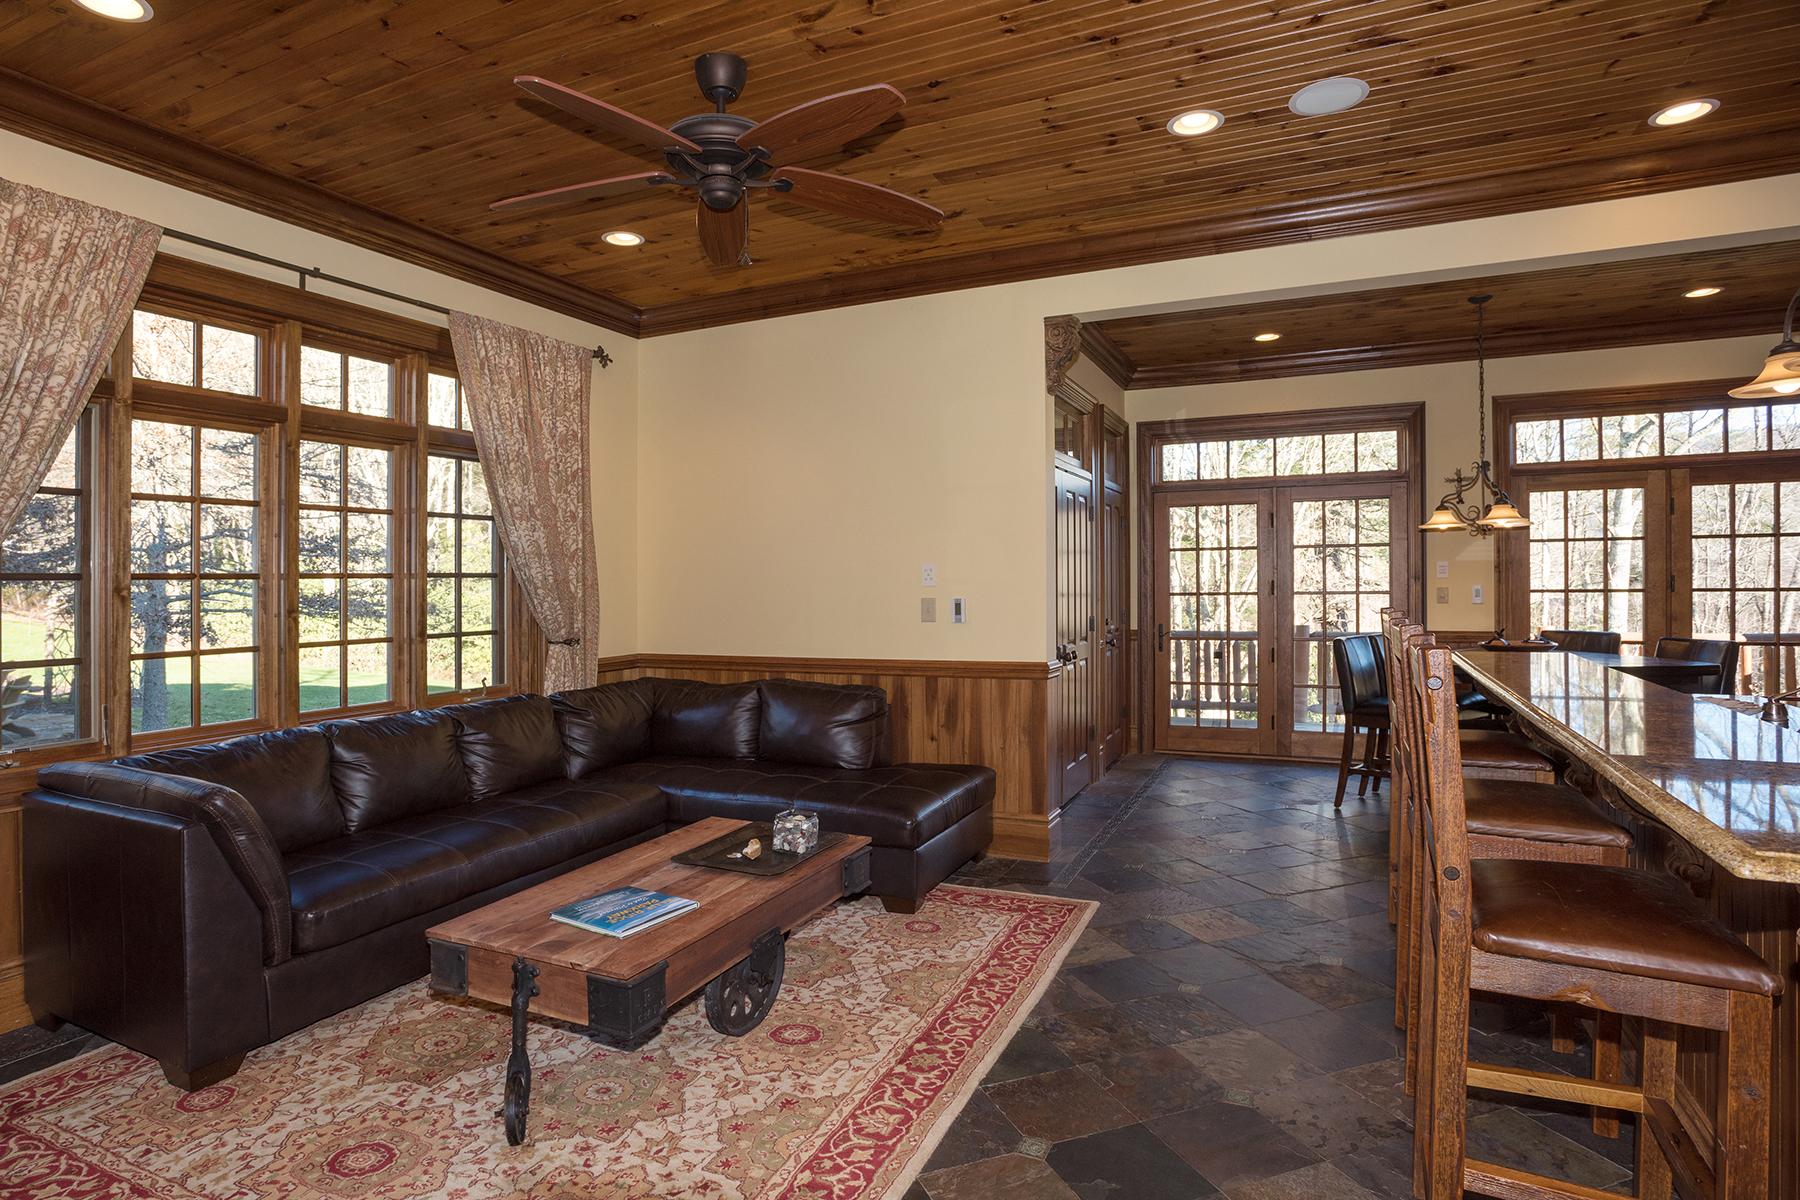 Additional photo for property listing at BANNER ELK - THE FARM AT BANNER ELK 799  Farm Loop Rd,  Banner Elk, North Carolina 28604 United States